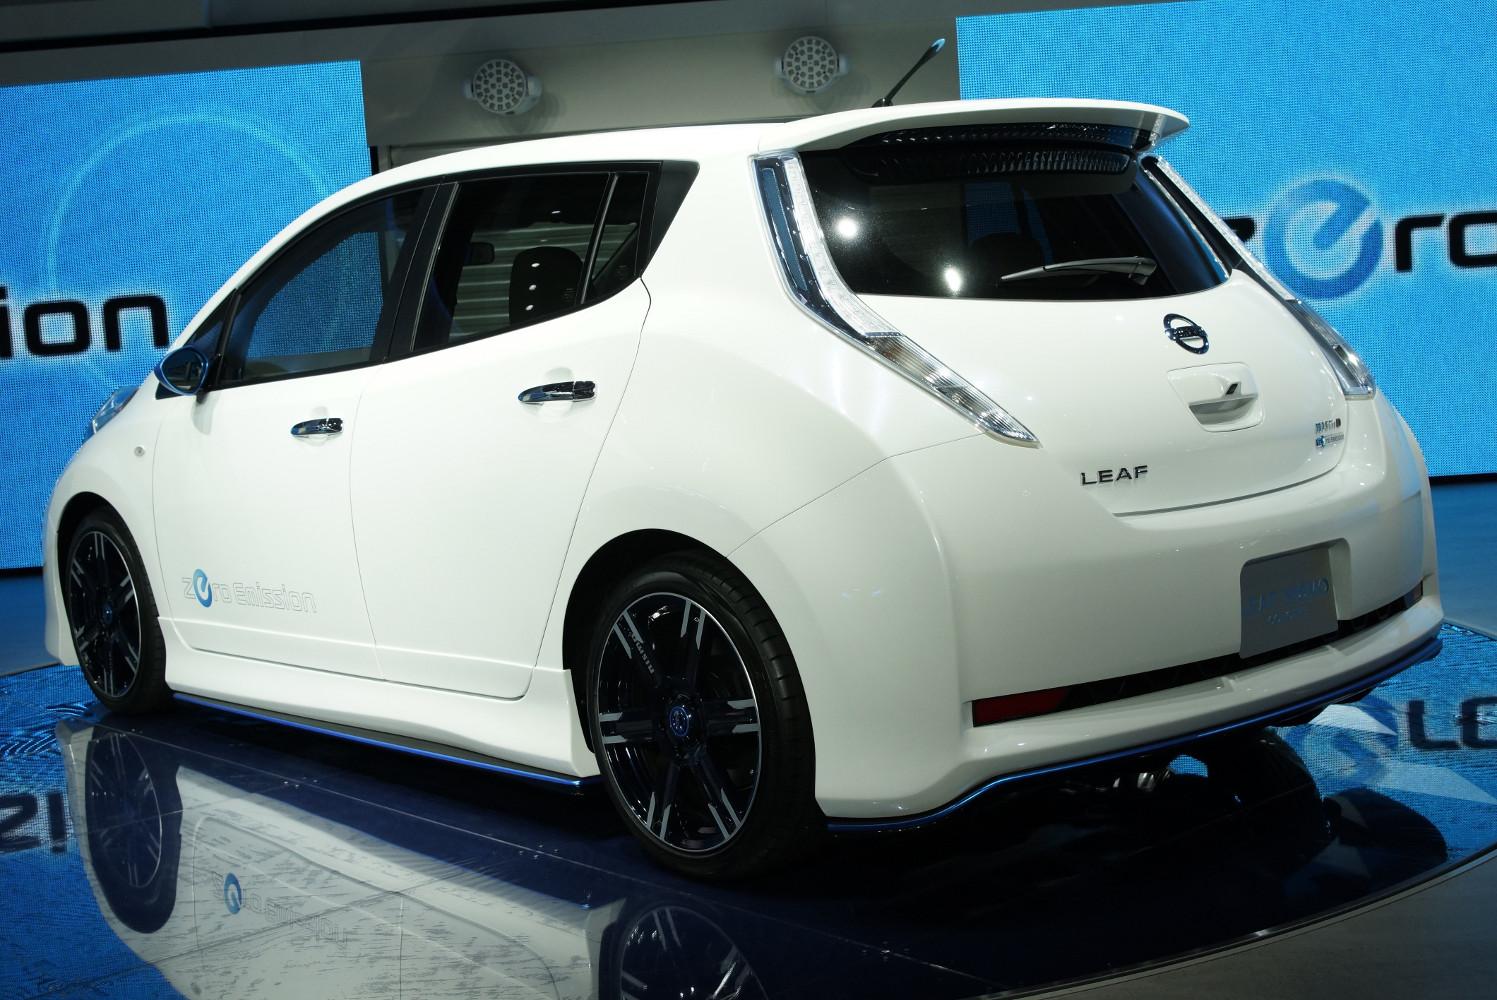 nissan leaf nismo kleinserie der tuning version in japan elektroauto blog. Black Bedroom Furniture Sets. Home Design Ideas